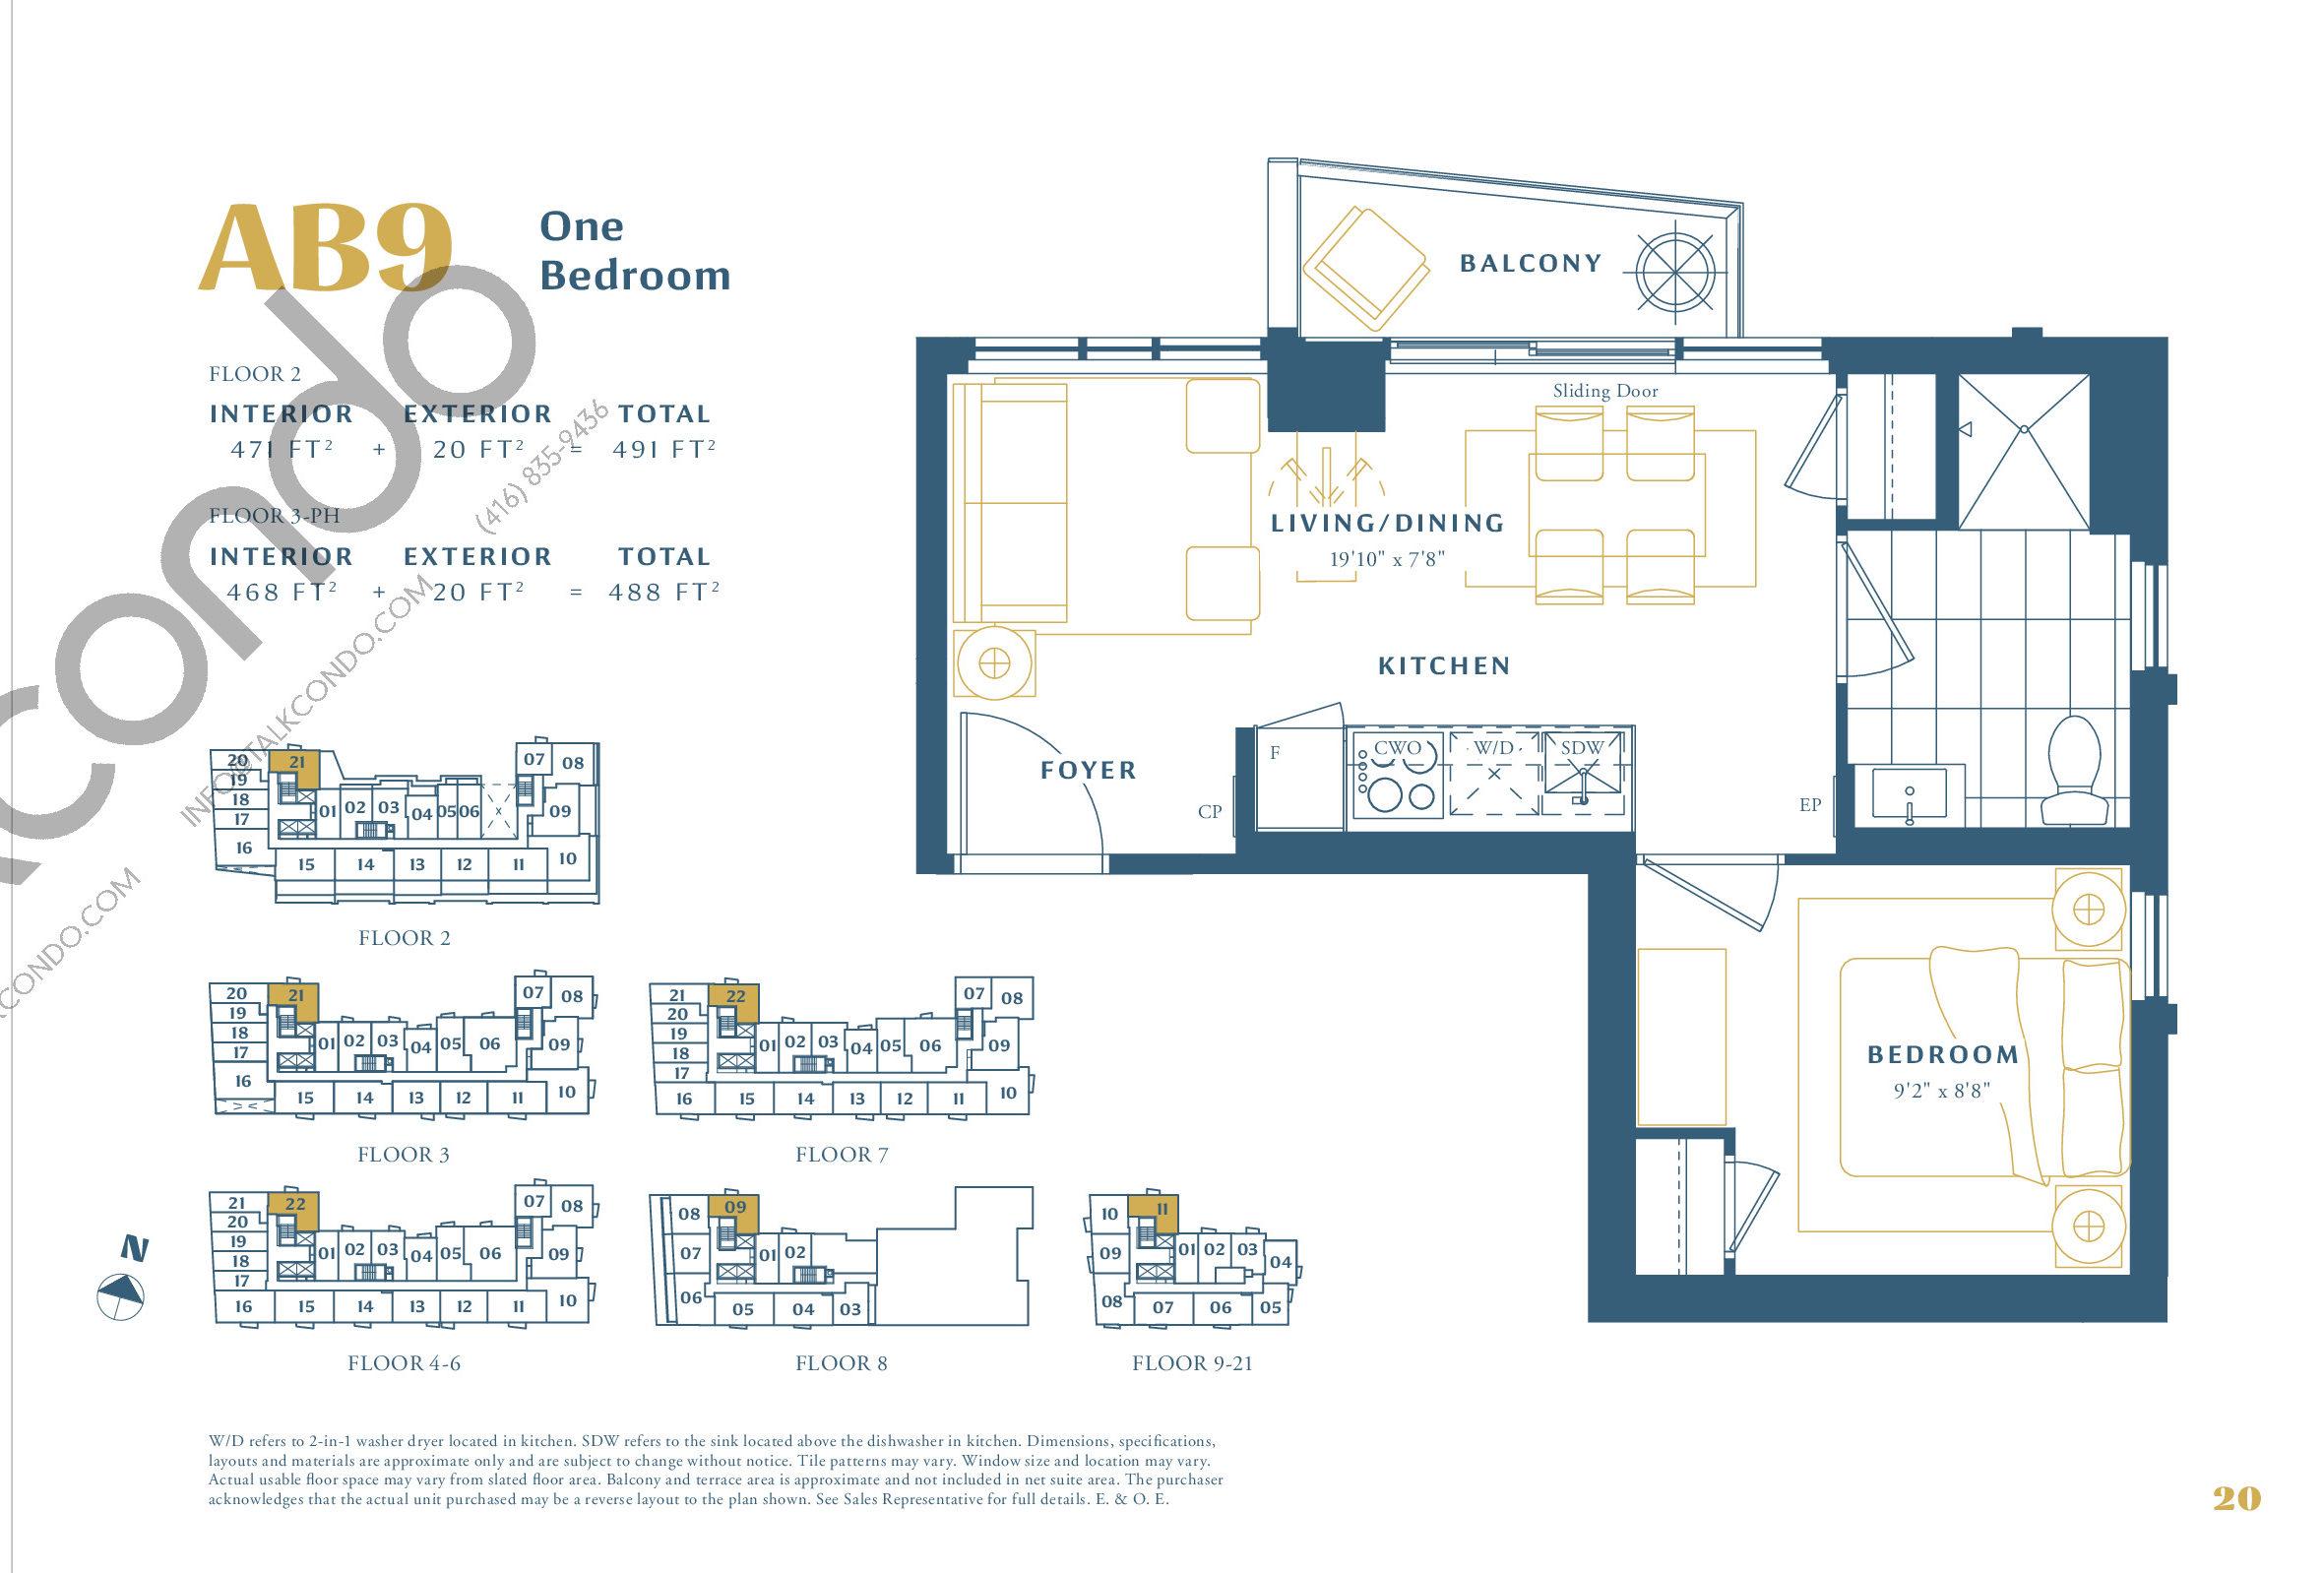 AB9 Floor Plan at The Borough Condos - Tower A - 471 sq.ft